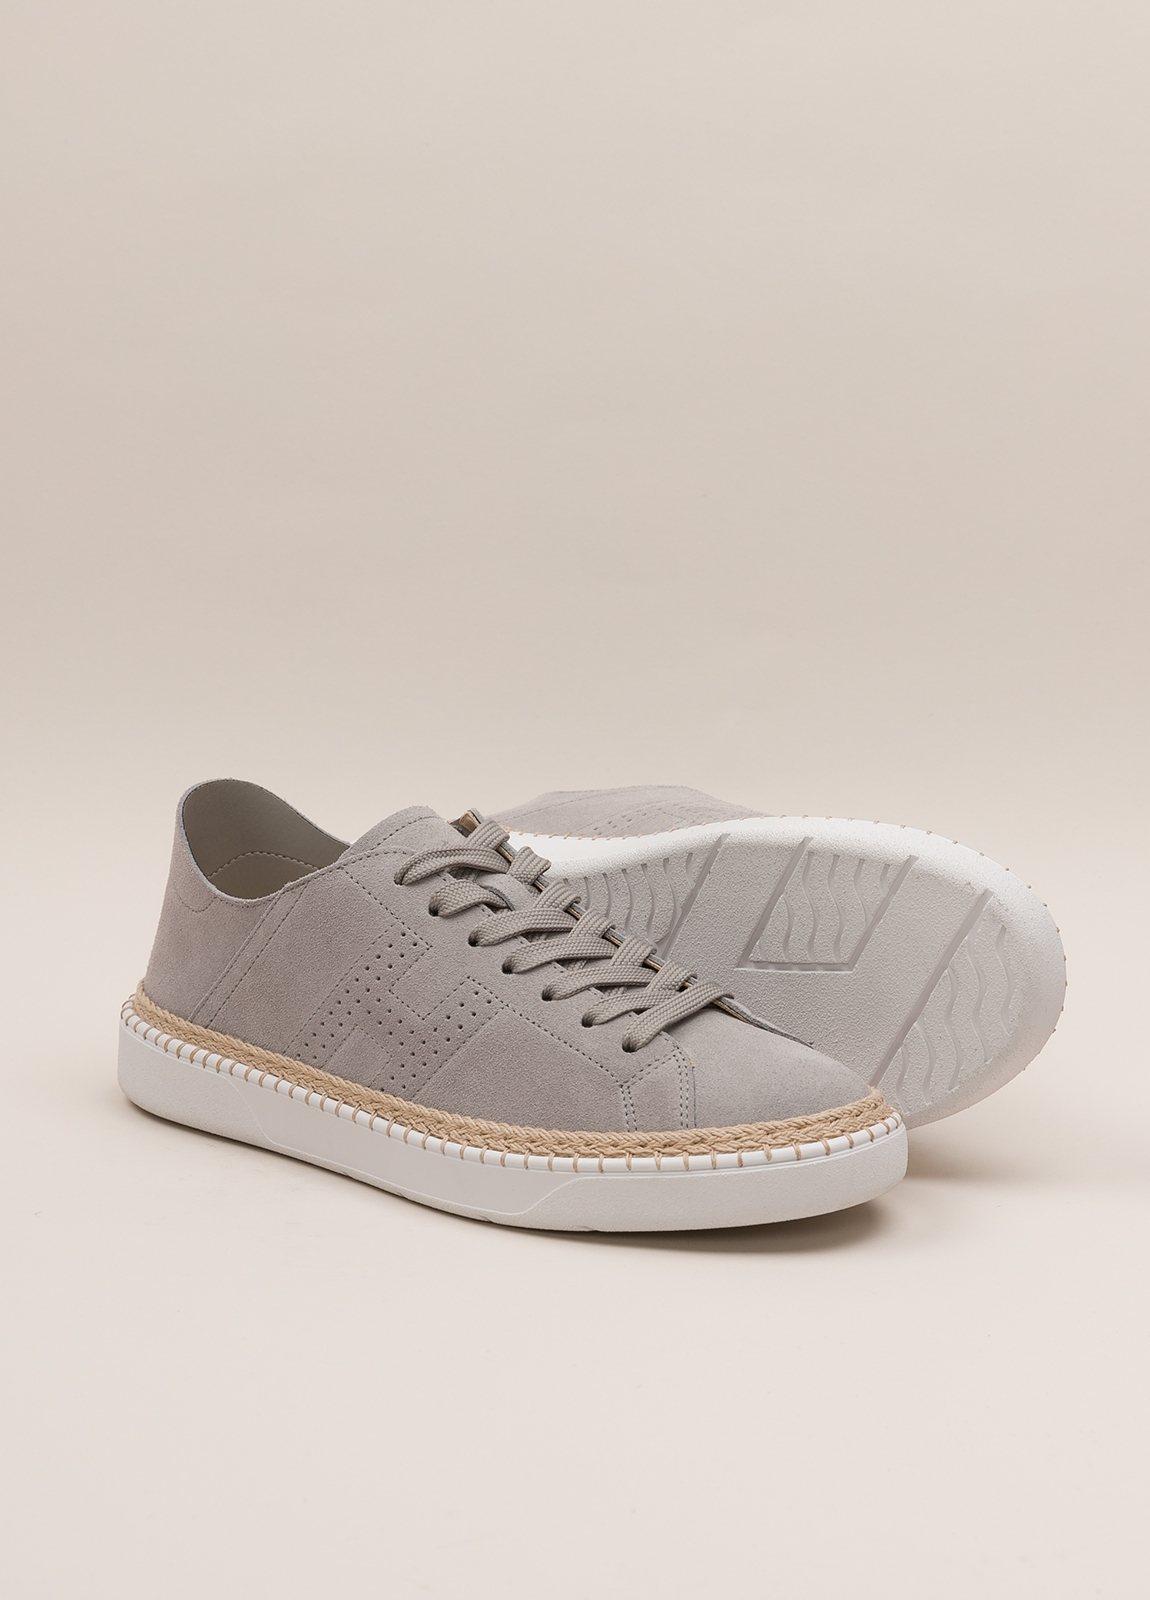 Calzado sport HOGAN gris - Ítem2